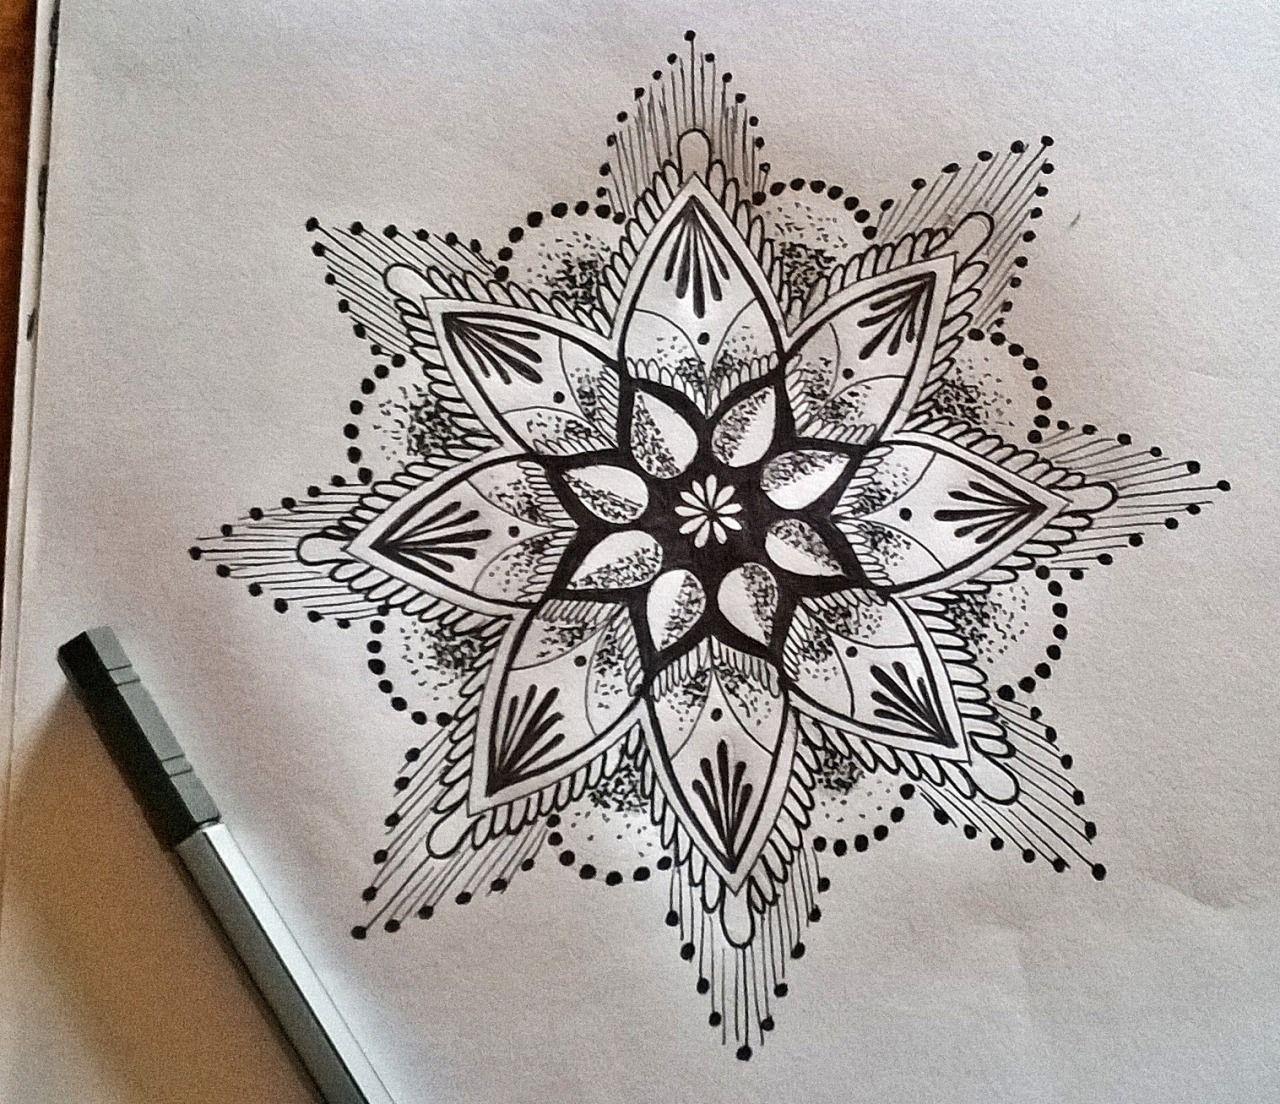 Nice Http://mandala Designs.tumblr.com/post/88471363847